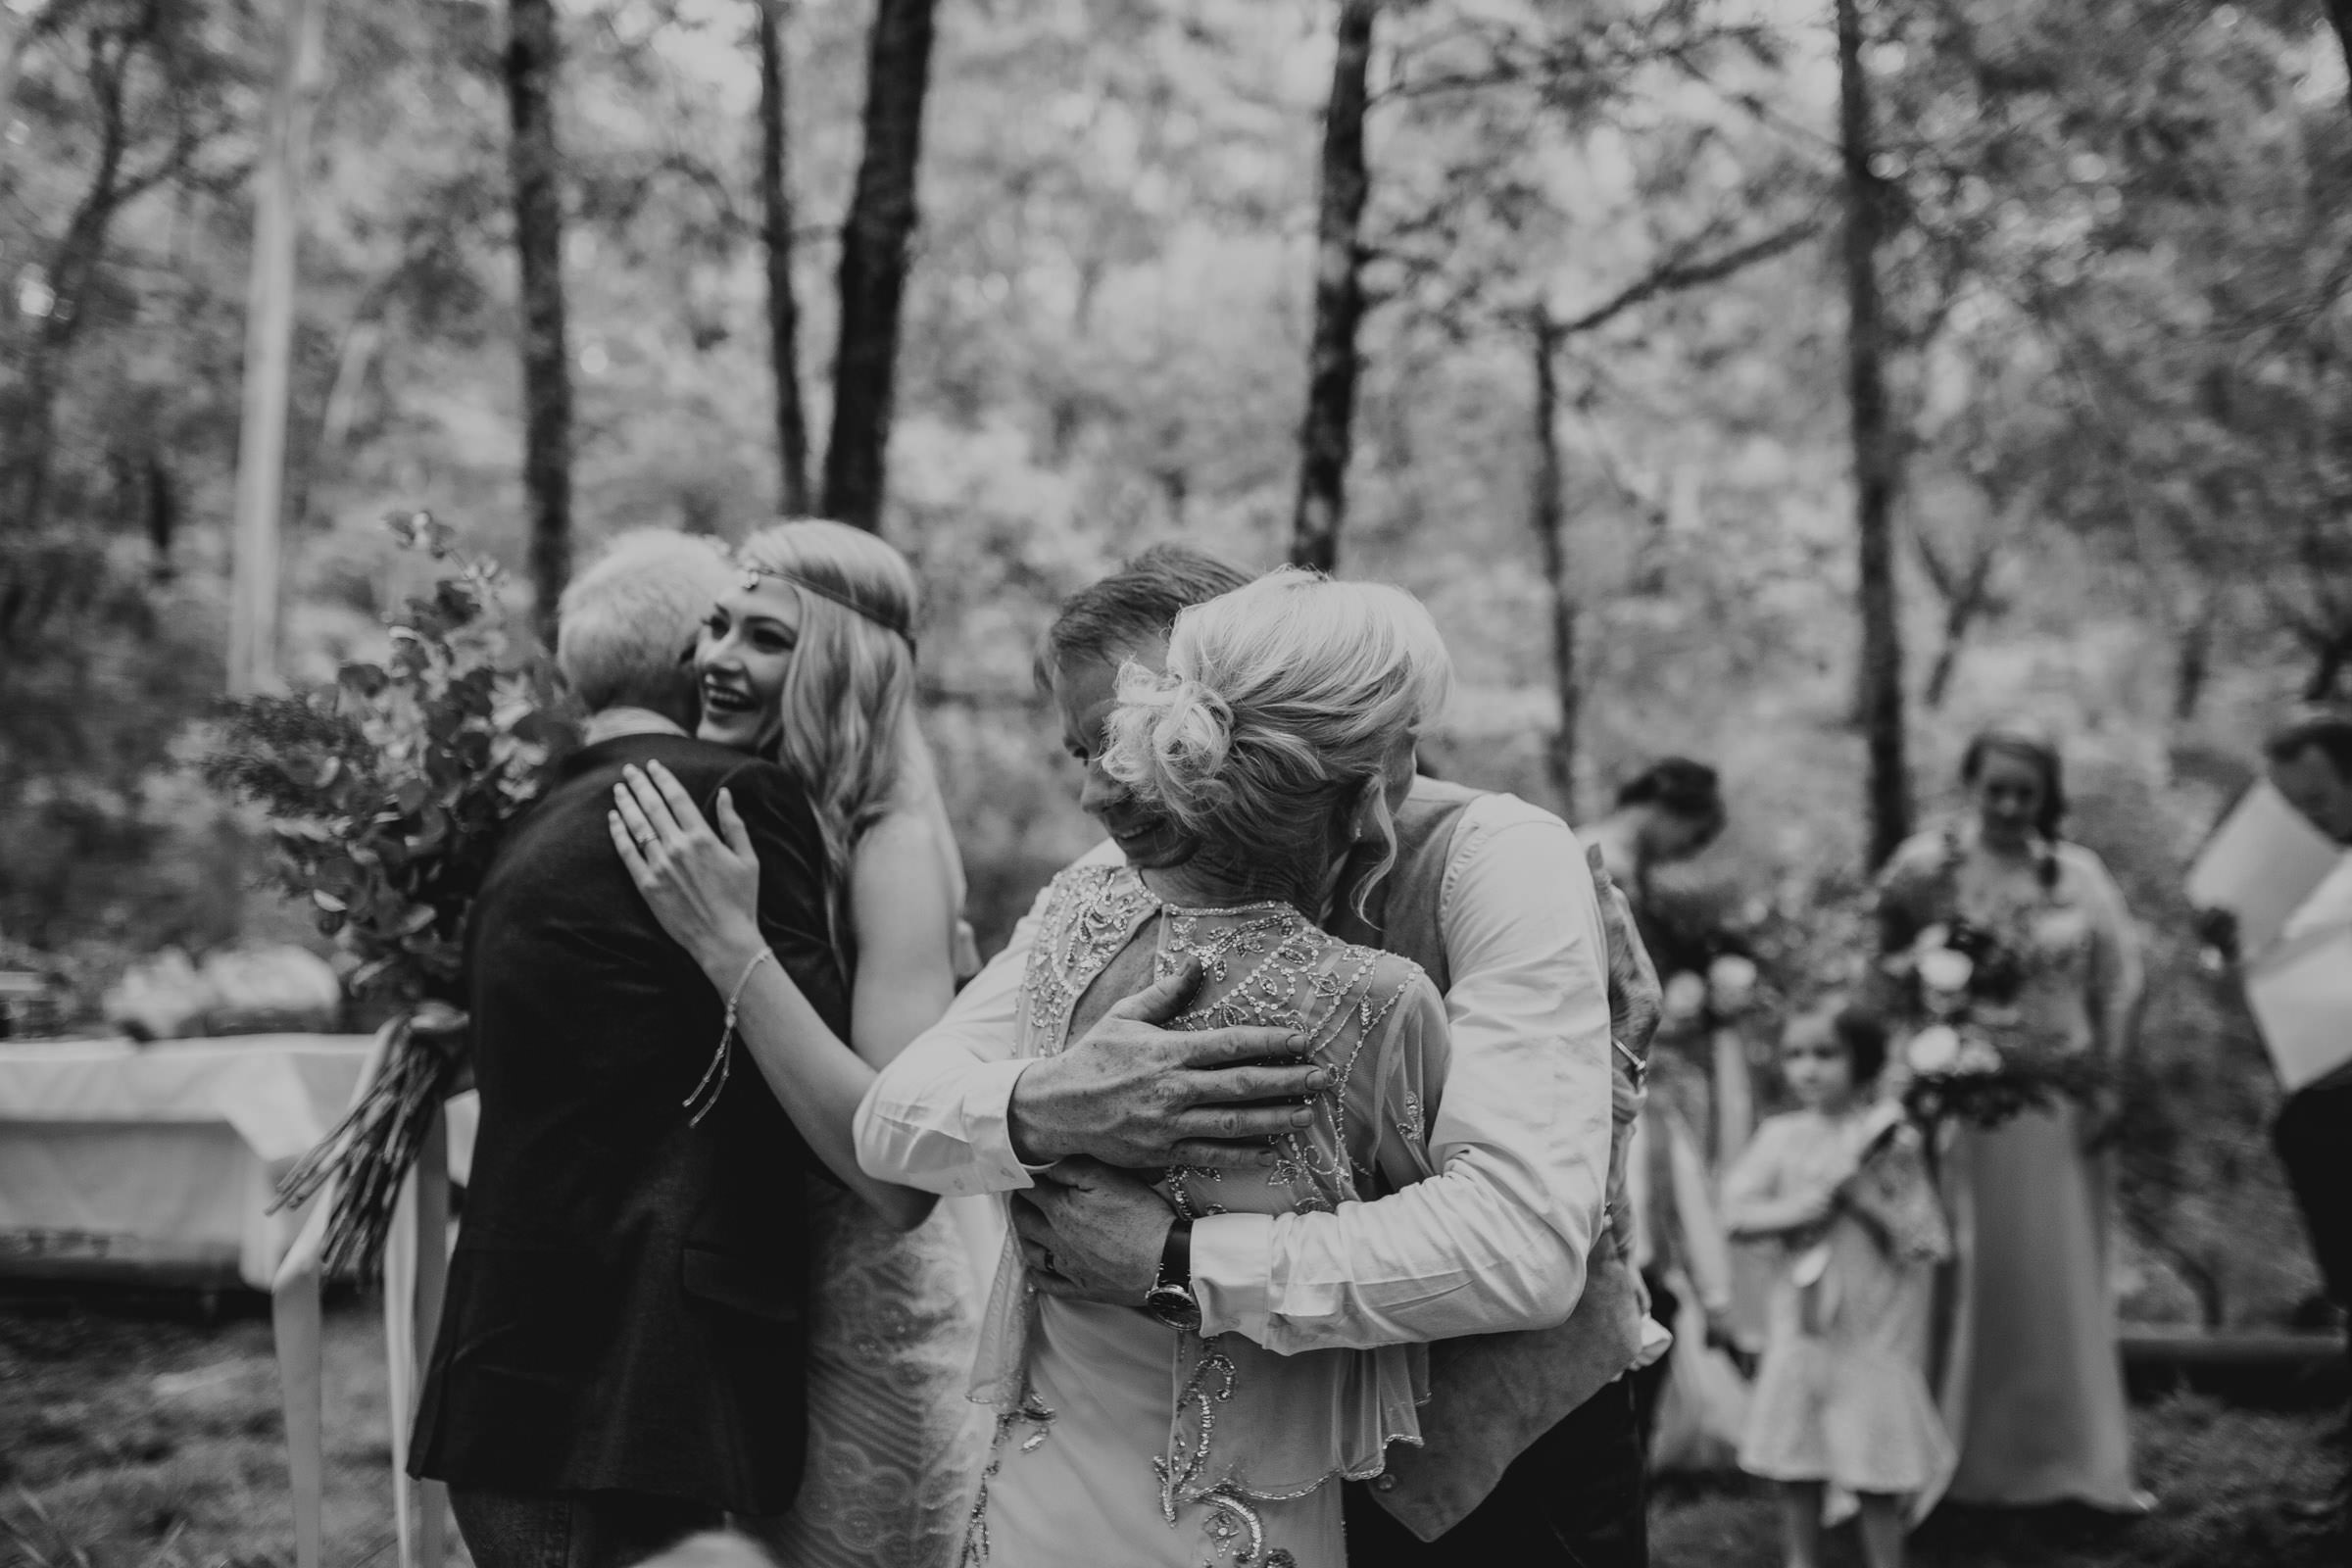 Emma+John+Far+South+Coast+Wedding+Festivl+Glamping+Bush-110.jpg